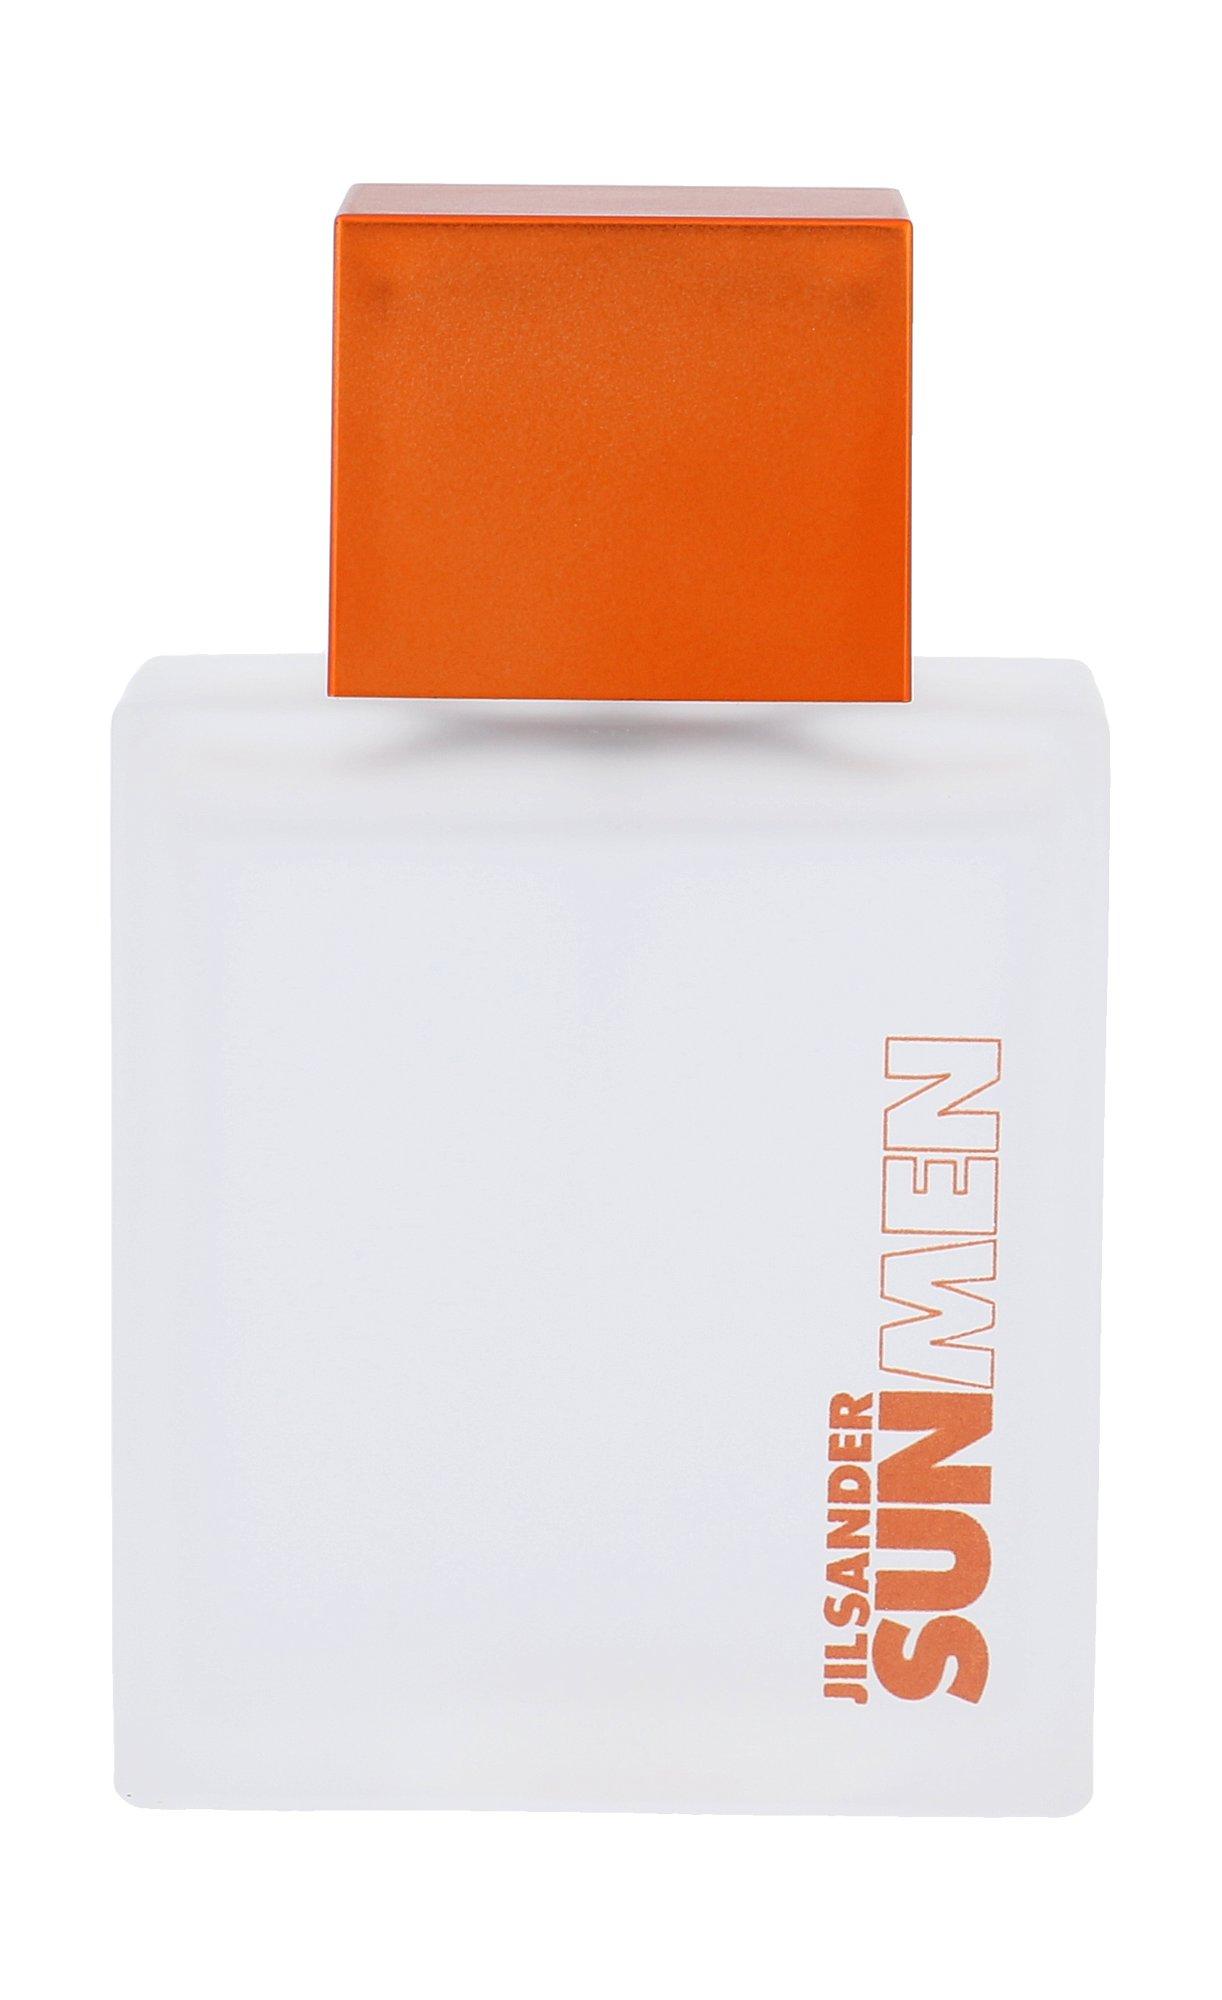 Jil Sander Sun For Men, Toaletná voda 40ml